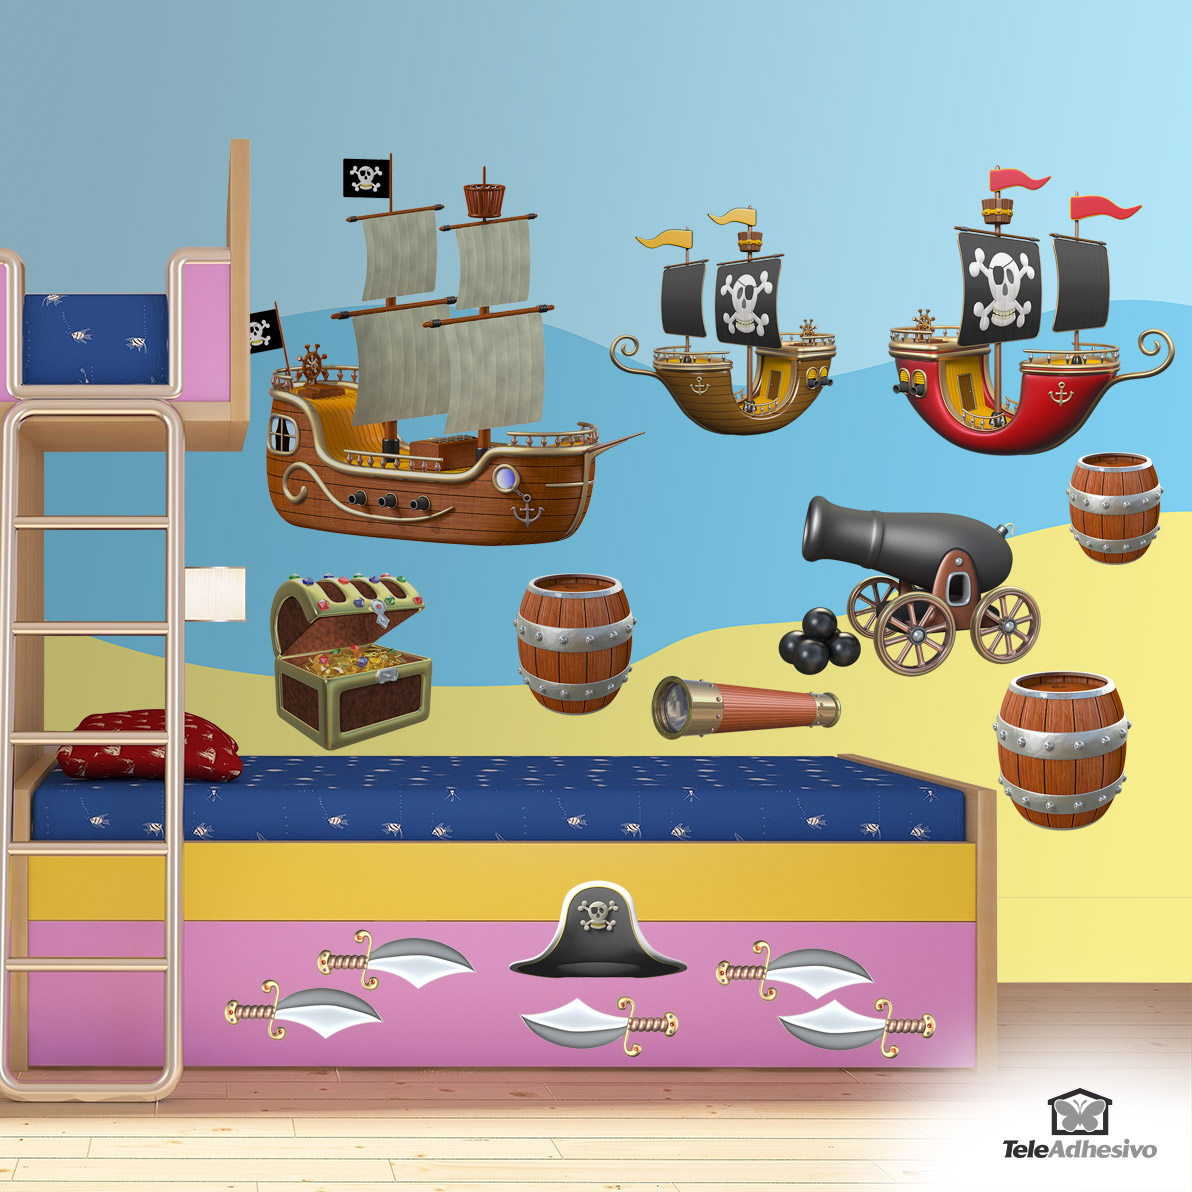 Vinilos infantiles de piratas blog teleadhesivo - Decoracion de barcos ...